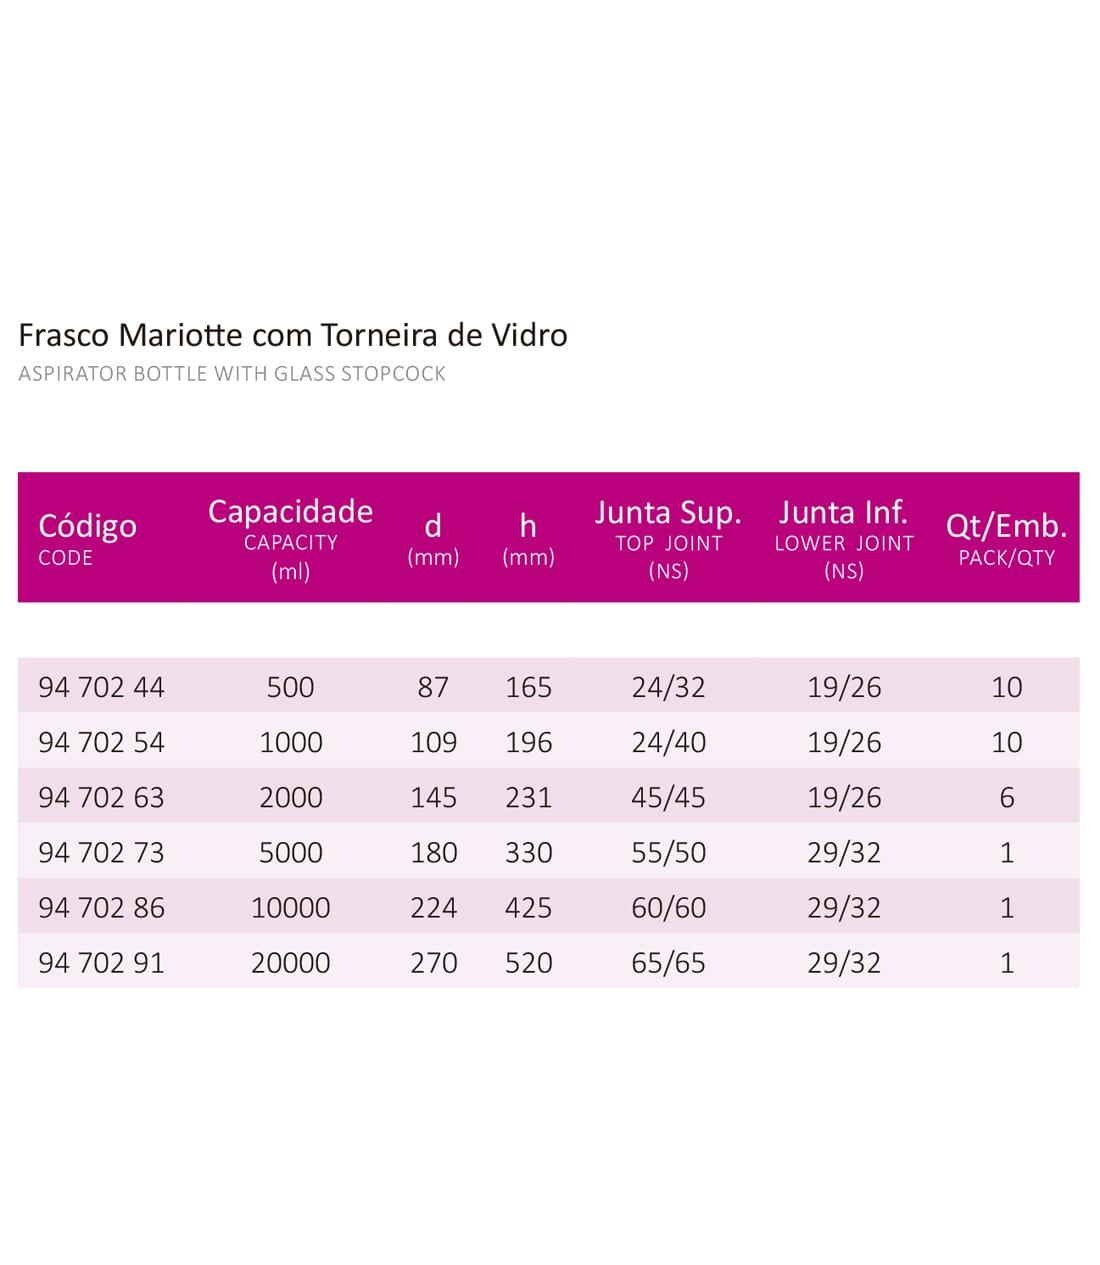 FRASCO MARIOTTE C/ J. E TORN. VIDRO 5000 ML - Laborglas - Cód. 9470273